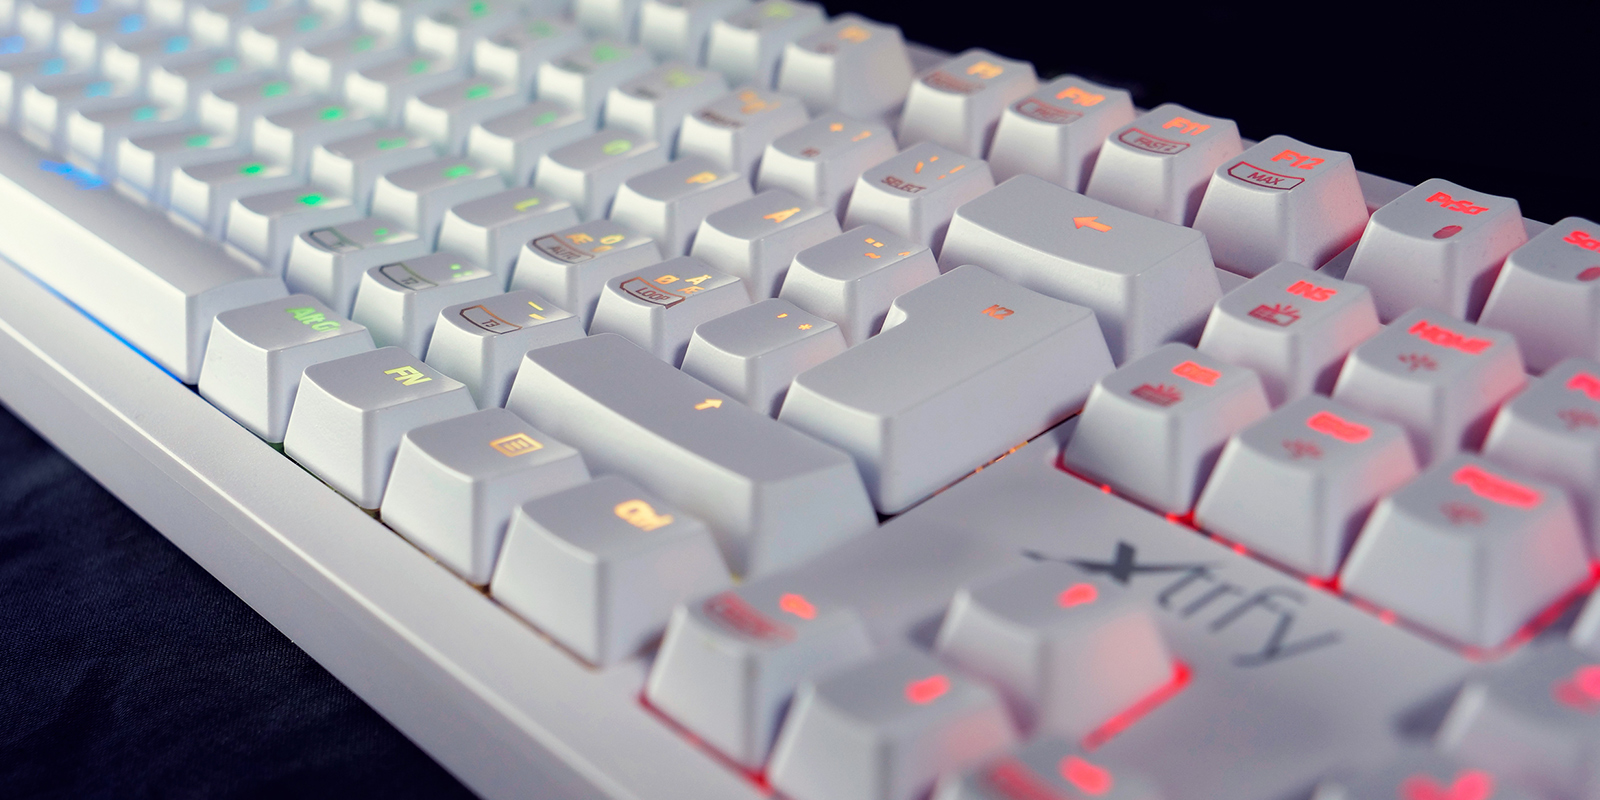 2-RGBホワイト 英語配列 赤軸メカニカル ゲーミングキーボード 1,680万色LEDイルミネーション(各キー設定可) UK配列3